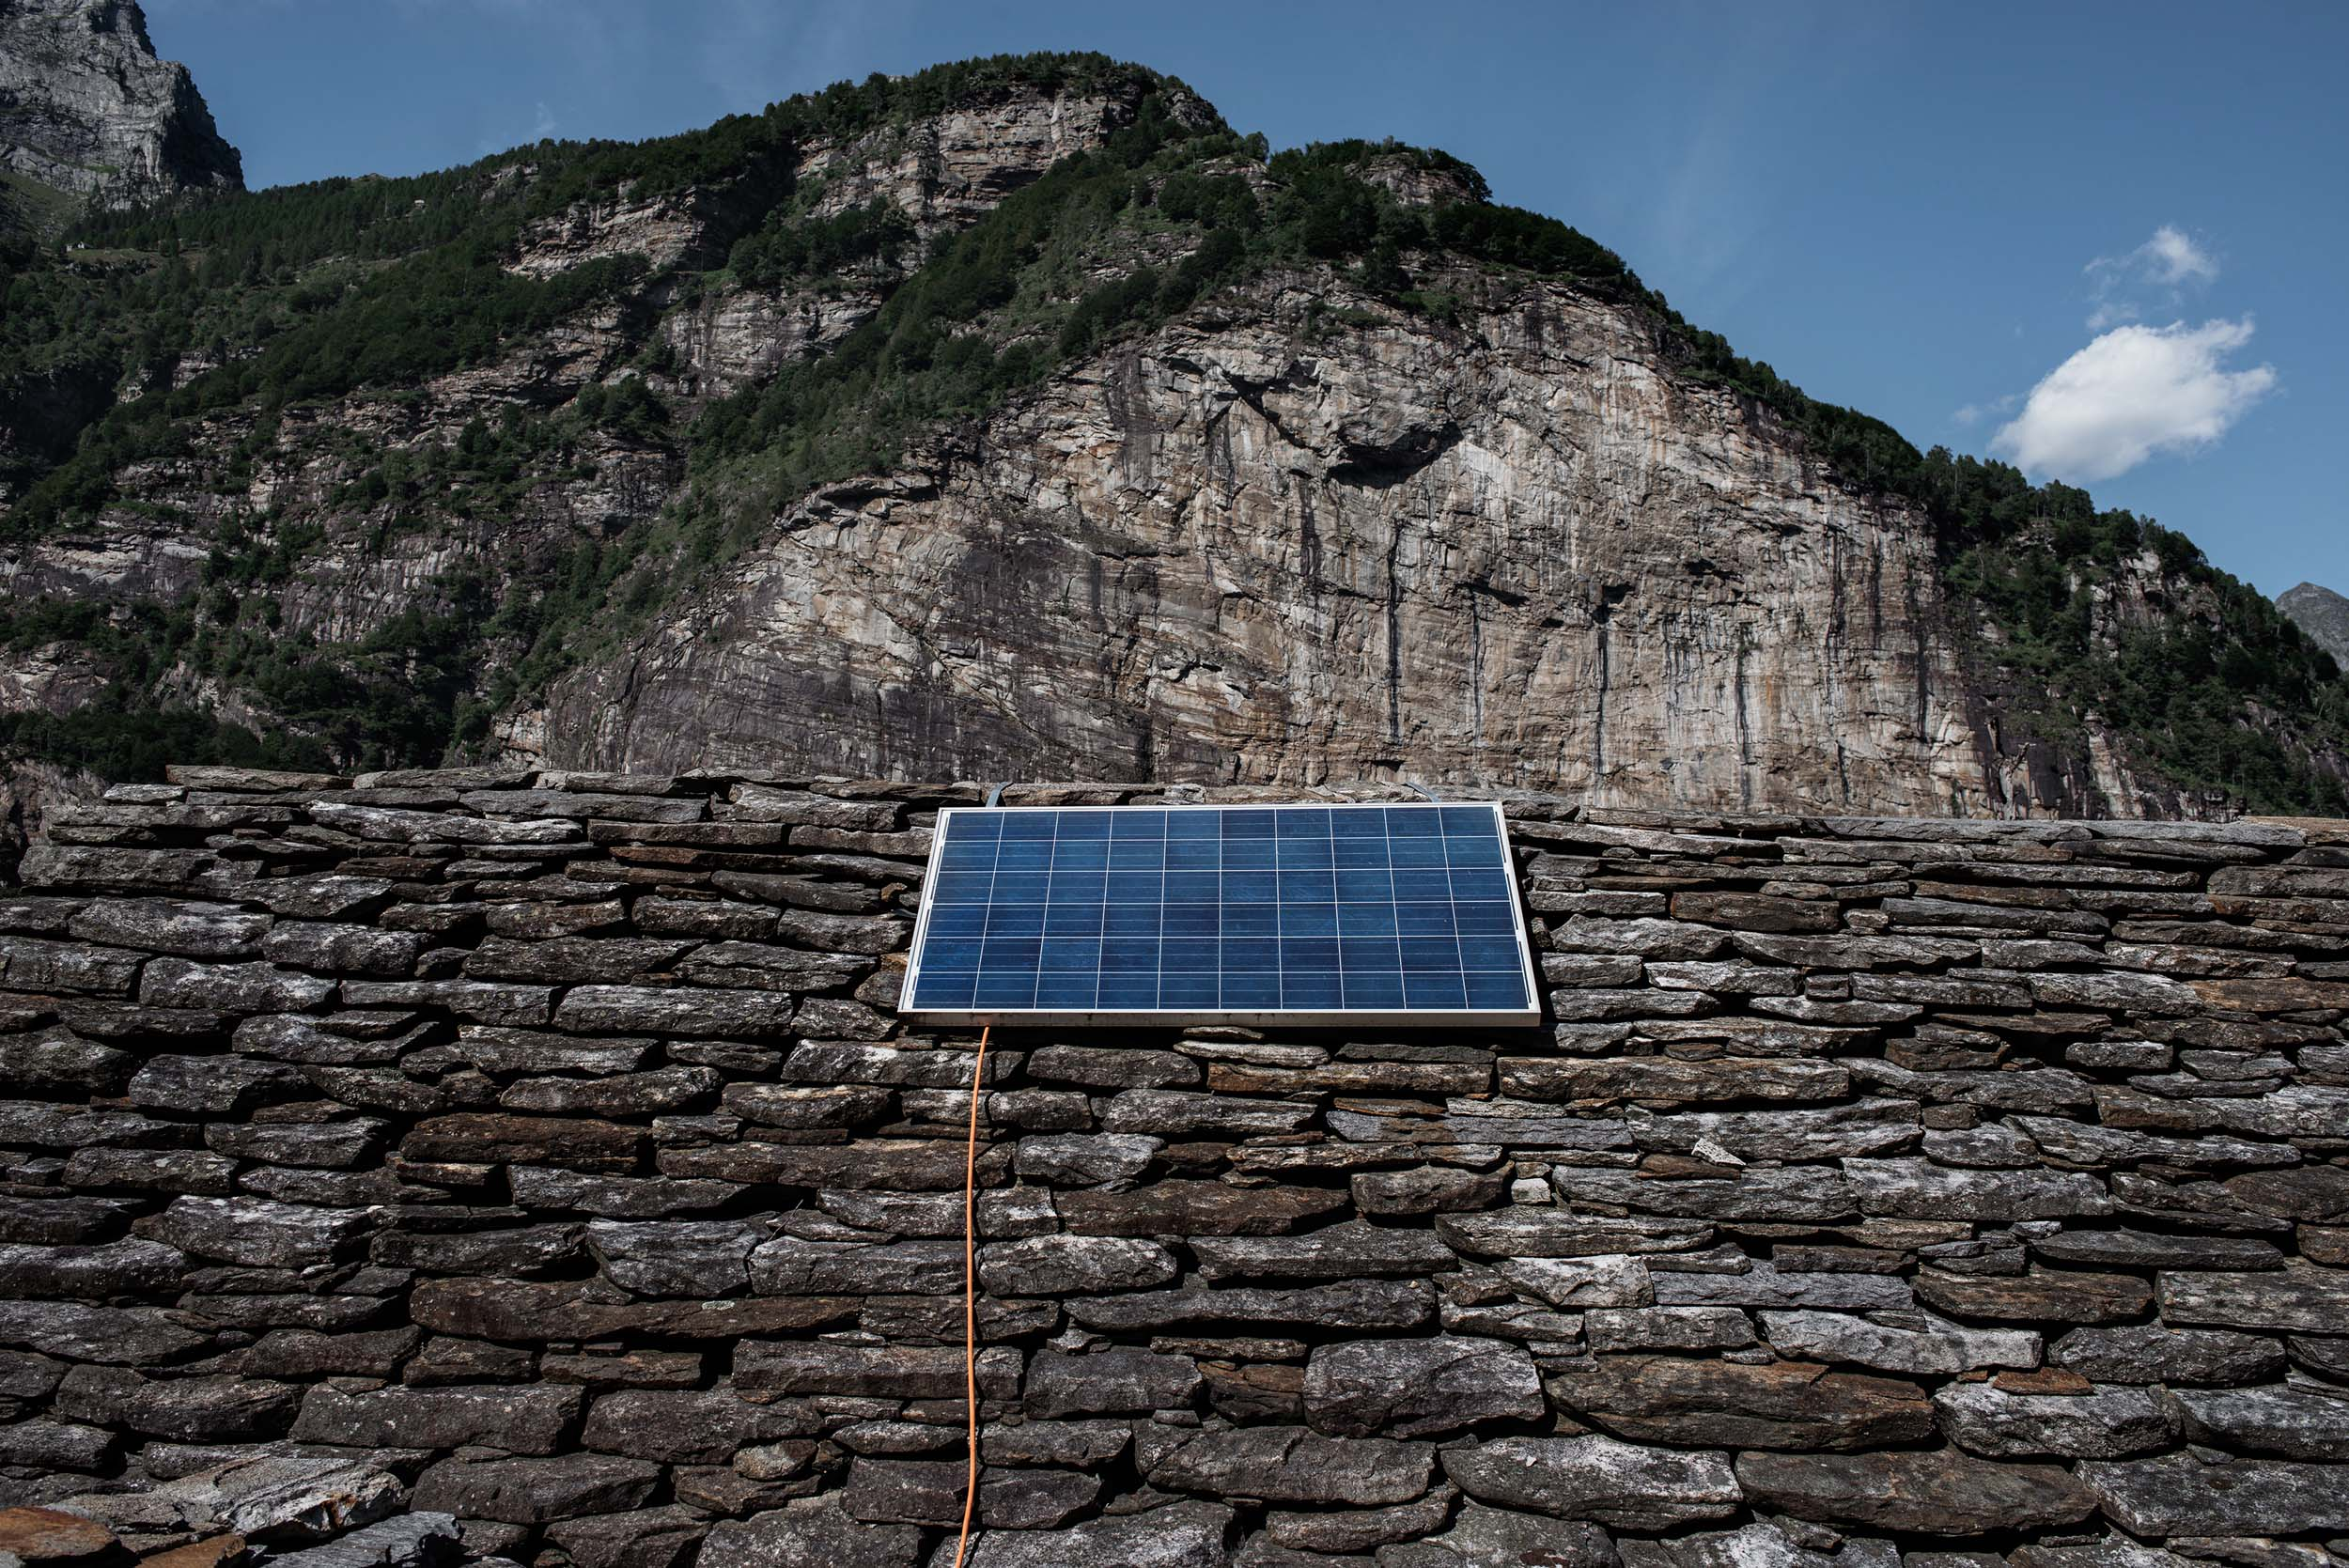 Photo Tiago Coelho - Artist in residence in the Verzasca Valley (2016)